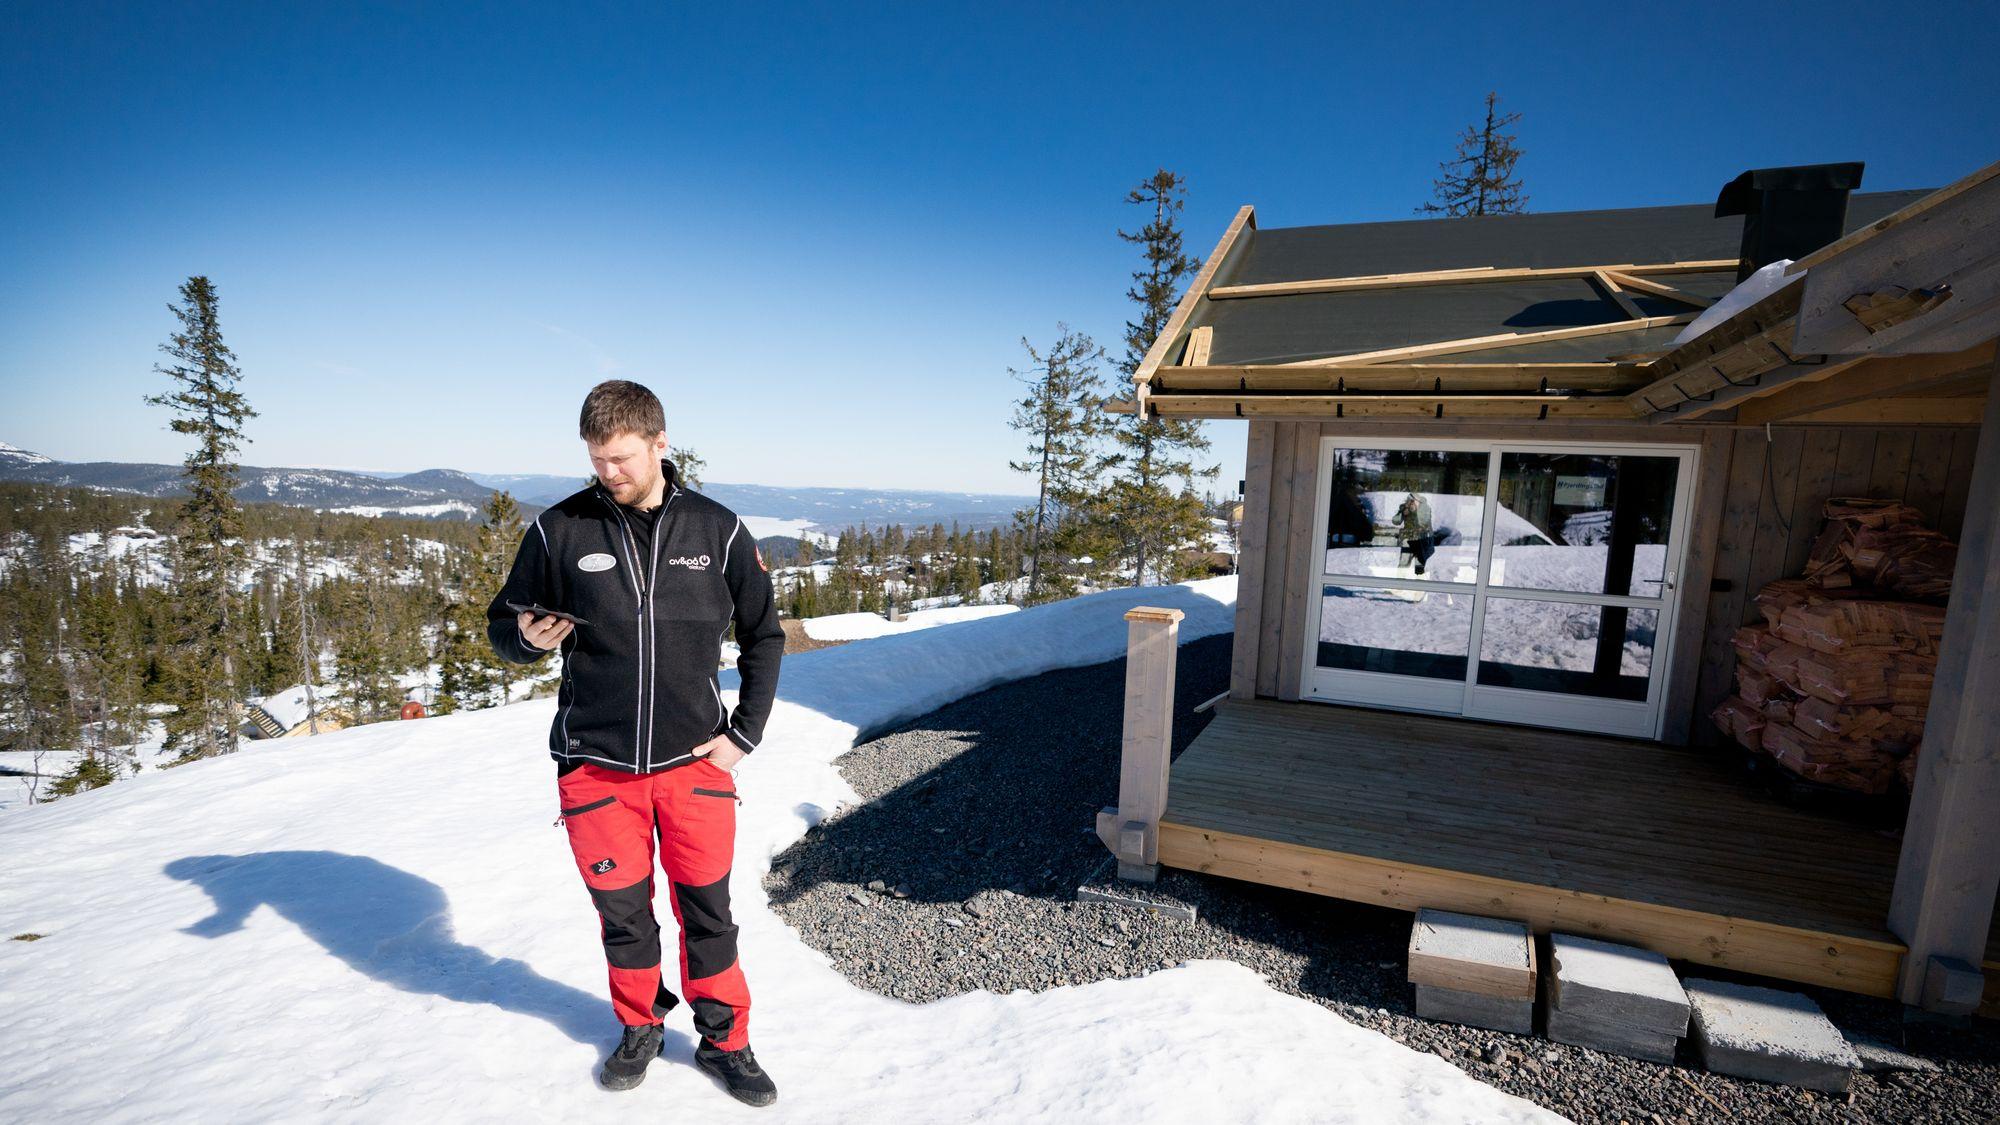 Cabin of the future: solar cells, battery, remote